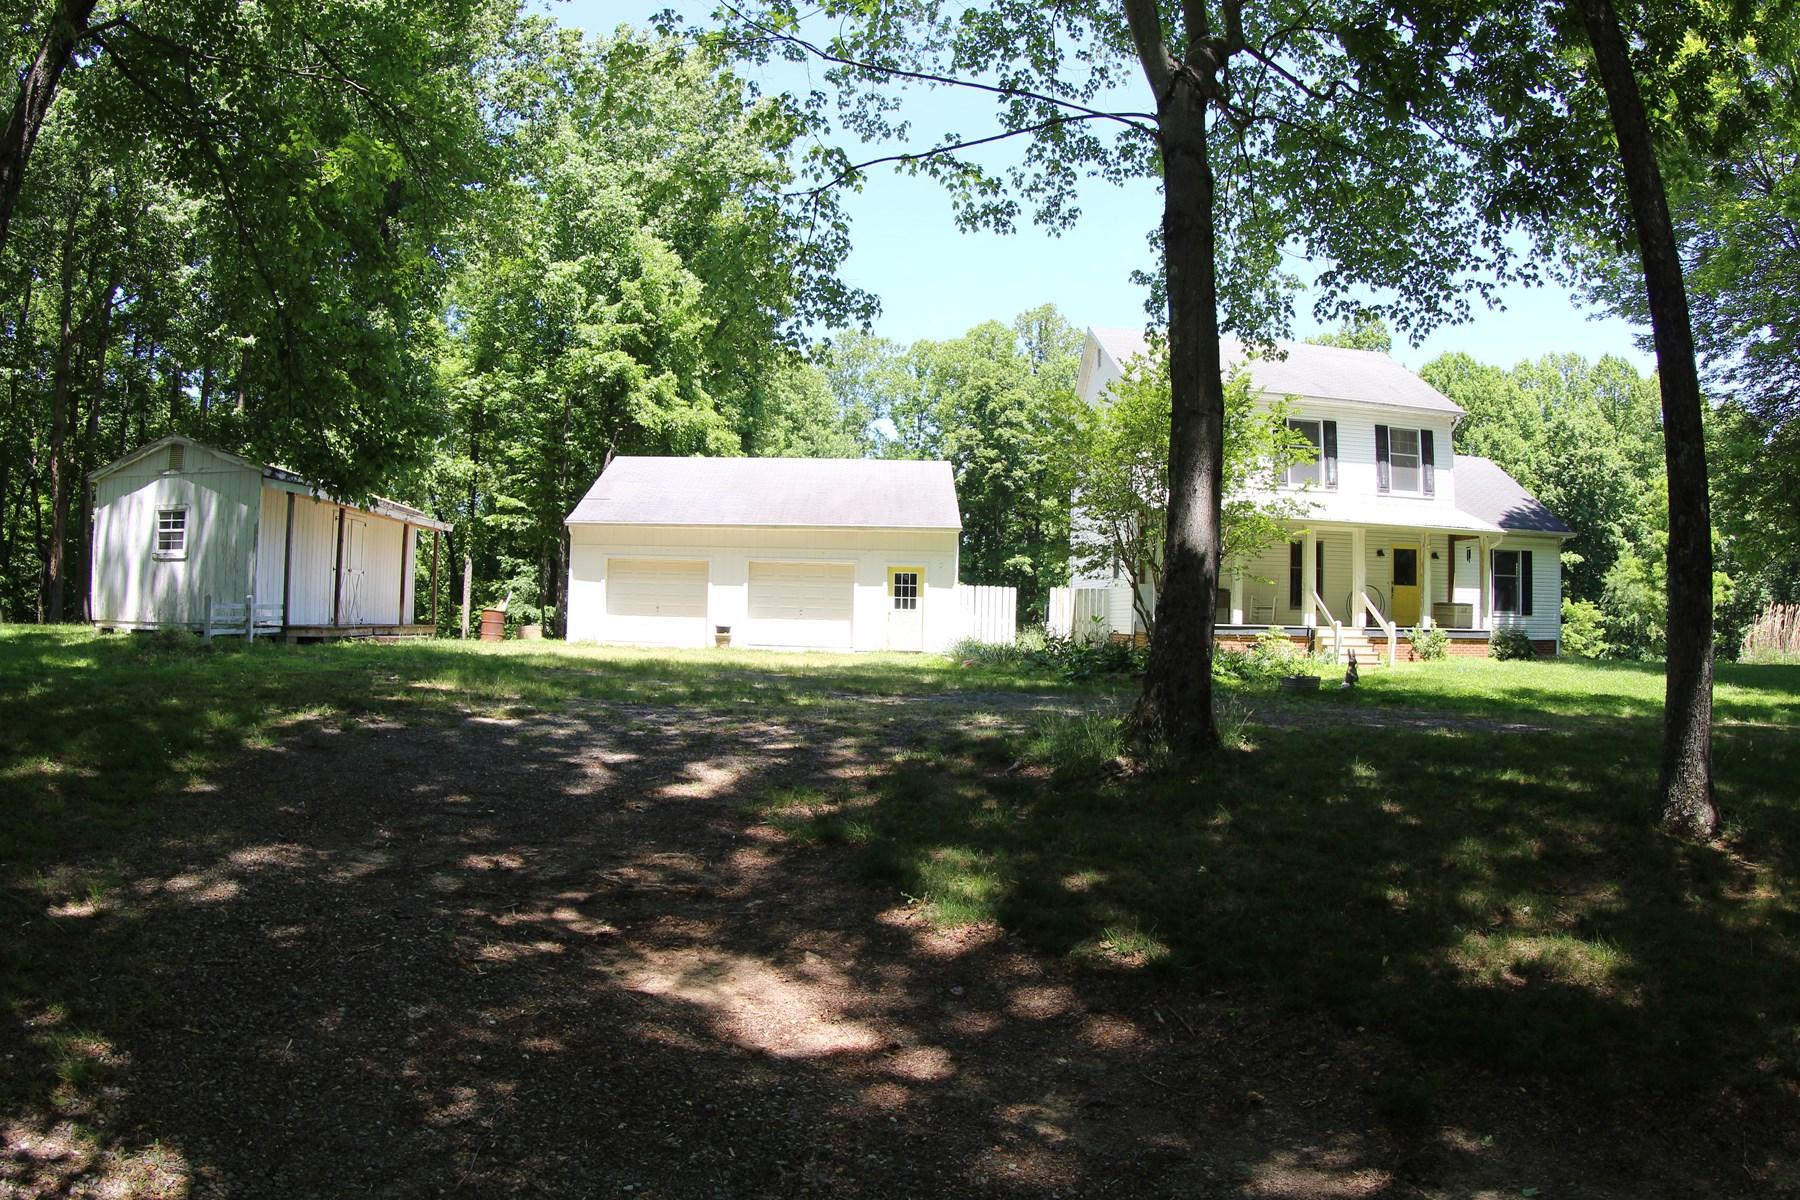 2 STORY MODULAR FARM HOUSE LOCATED IN PATRICK COUNTY, VA